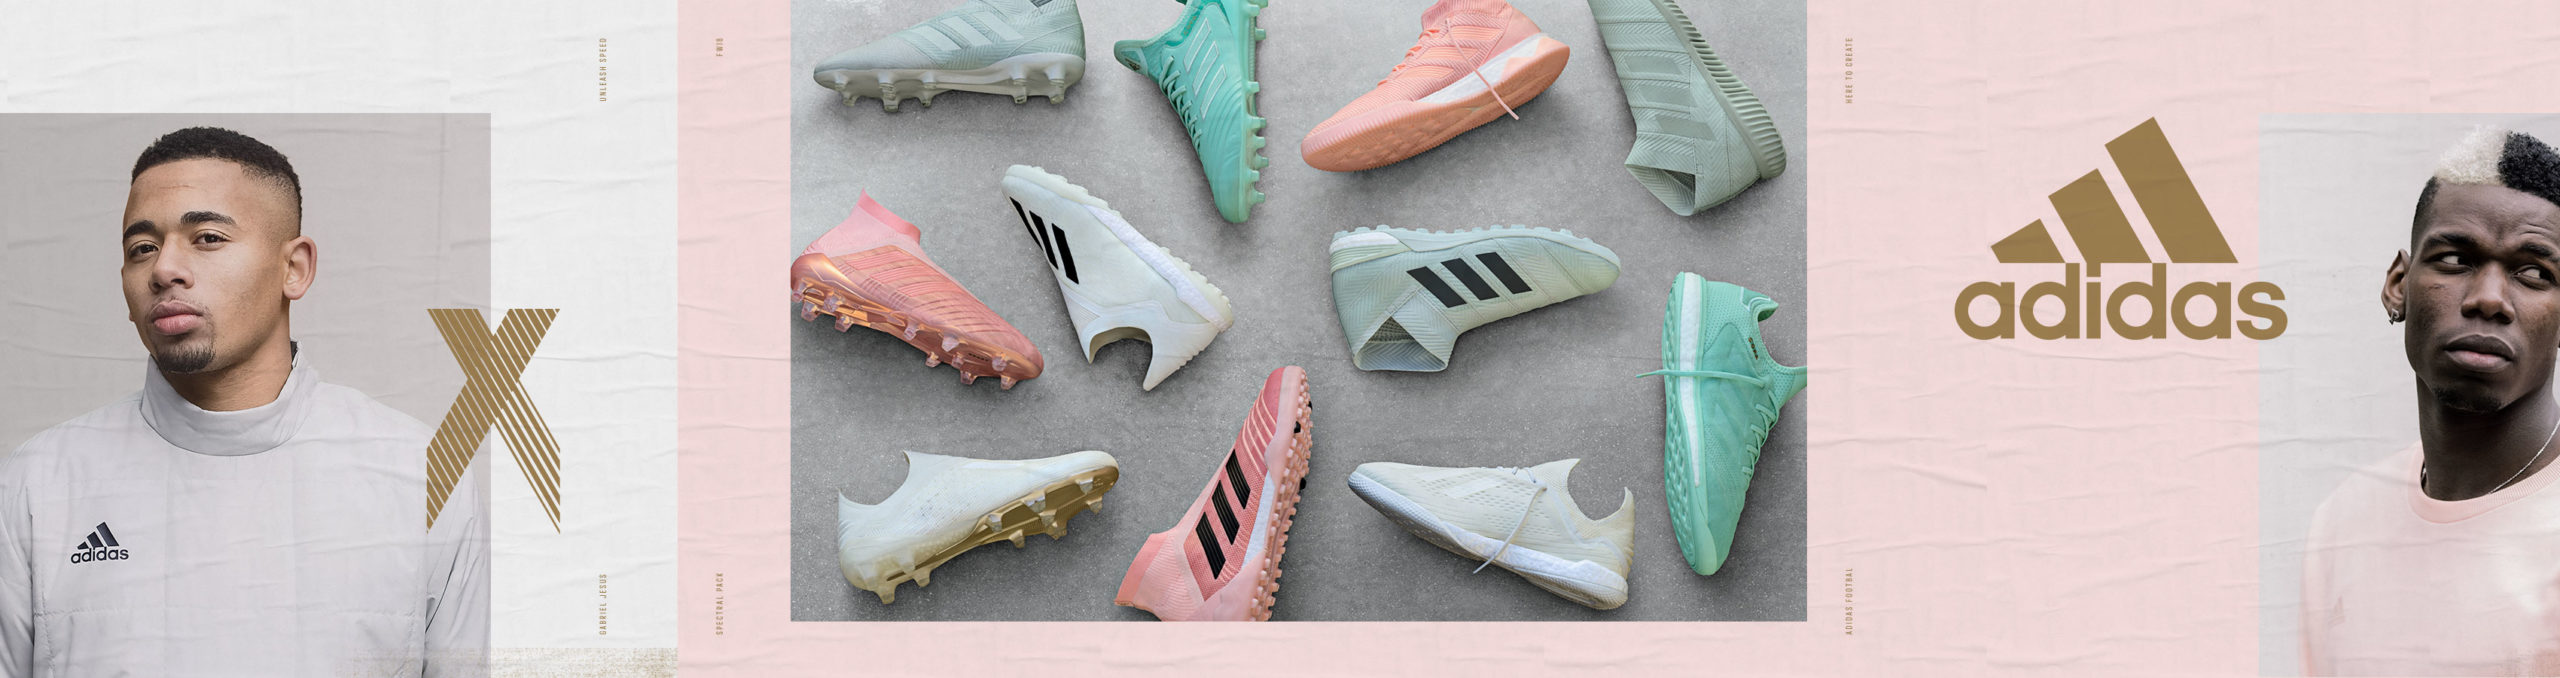 RobsonUnited2020_adidasFW18_Spectral03